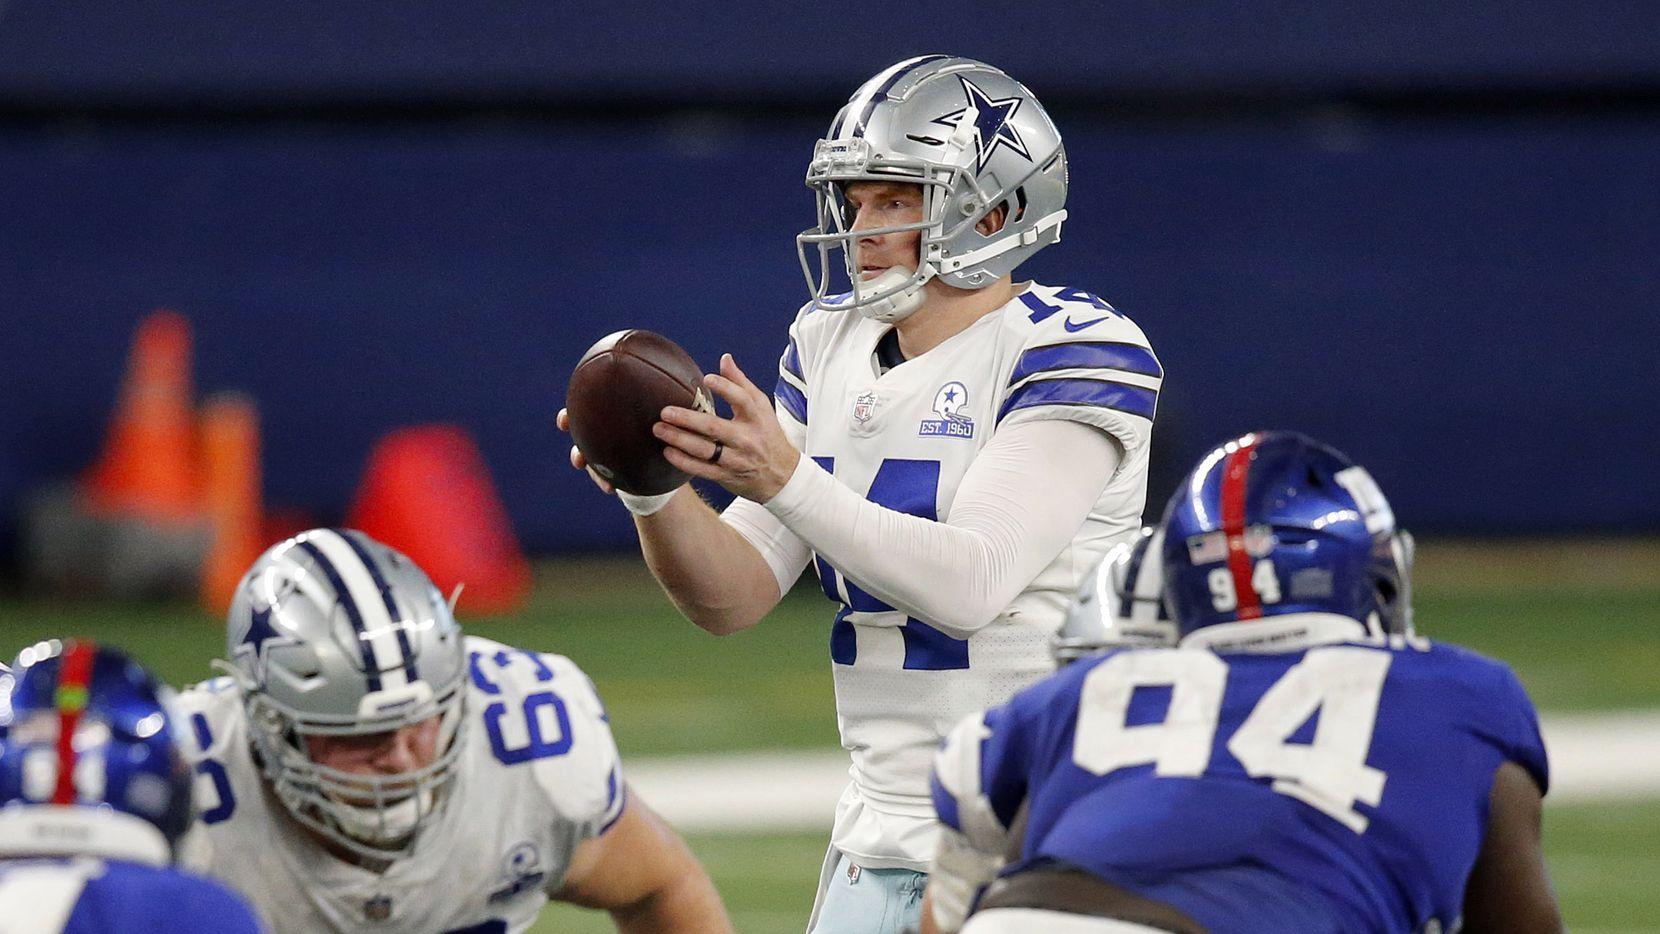 Dallas Cowboys quarterback Andy Dalton (14) takes a fourth quarter snap against the New York Giants at AT&T Stadium Stadium in Arlington, Texas, Sunday, October 11, 2020.